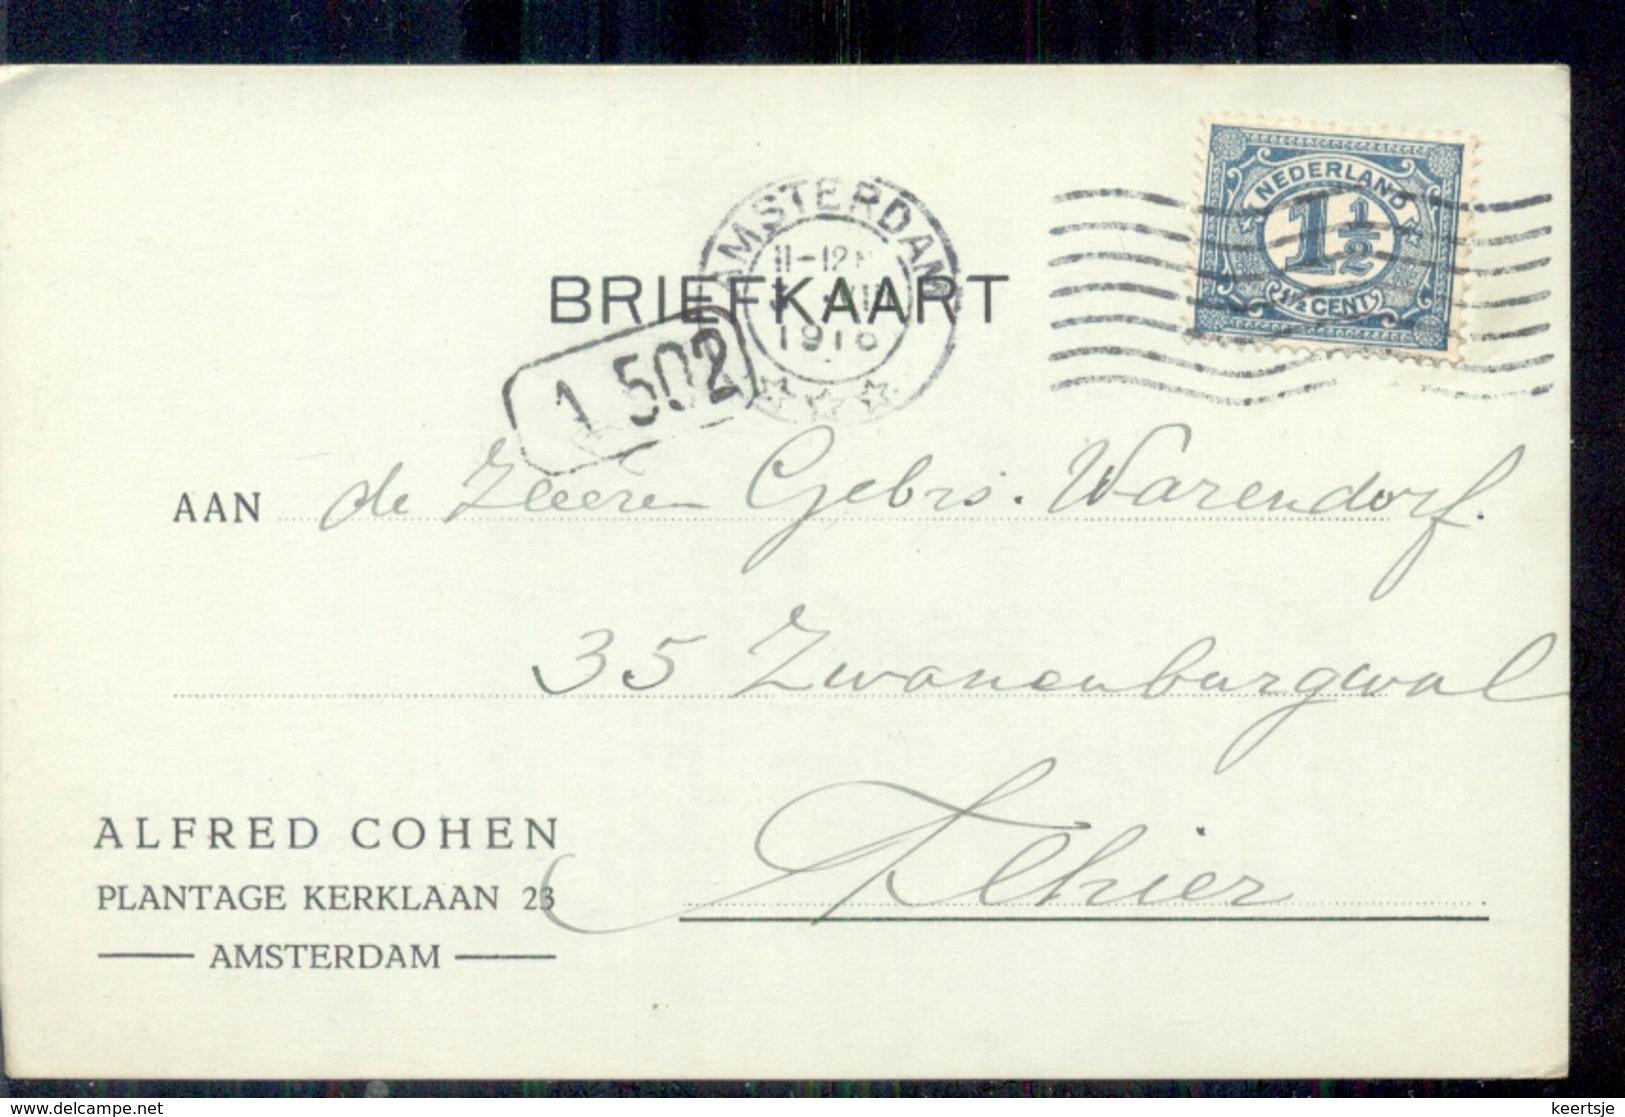 Amsterdam - Alfred Cohen - Plantage Kerklaan - 1916 - Amsterdam